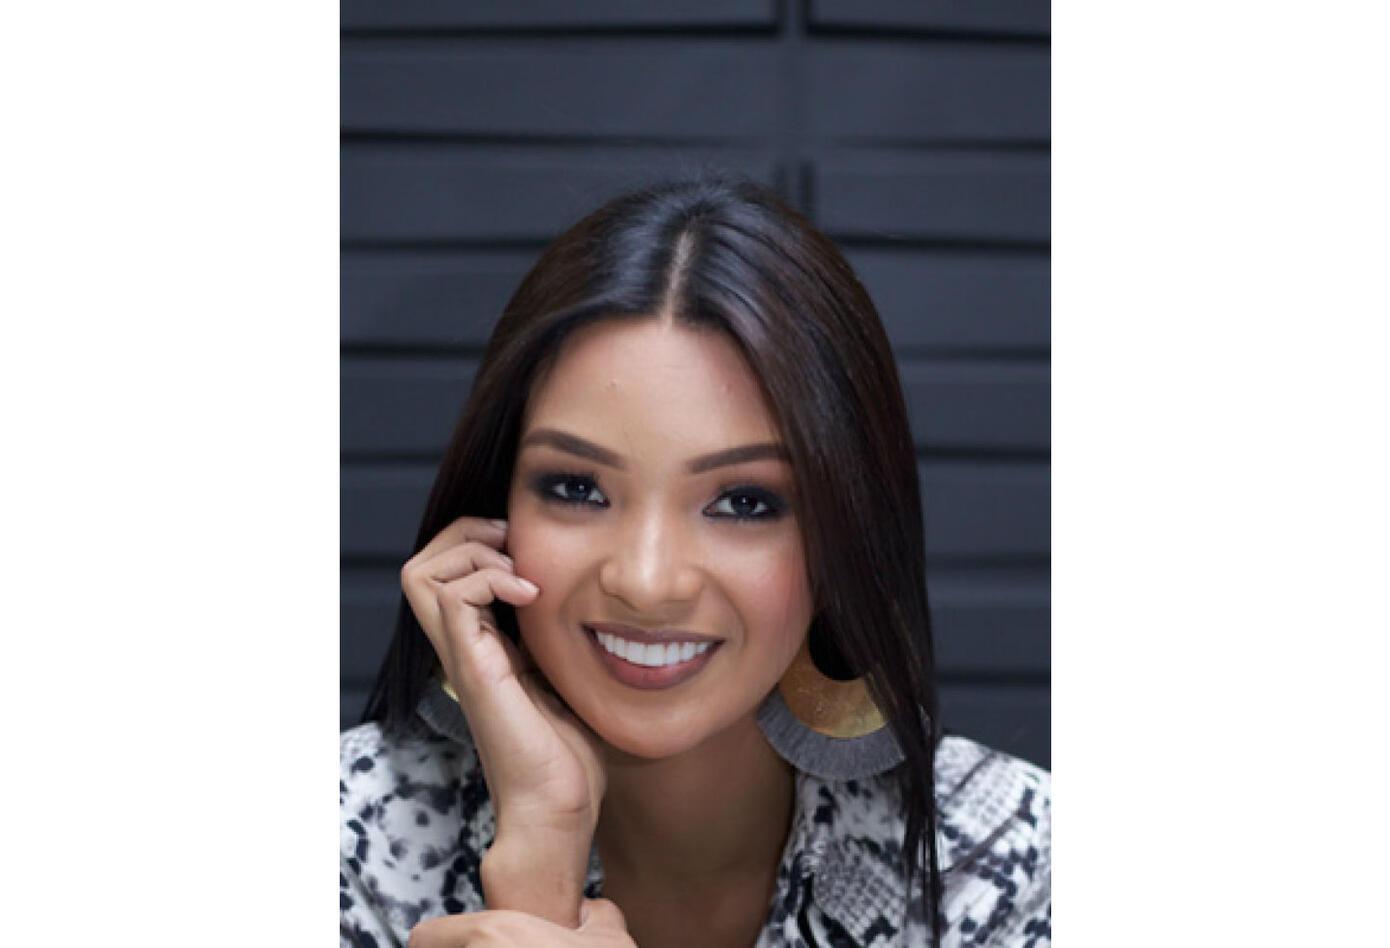 Andrea Carolina Martínez, señorita Cartagena 2019